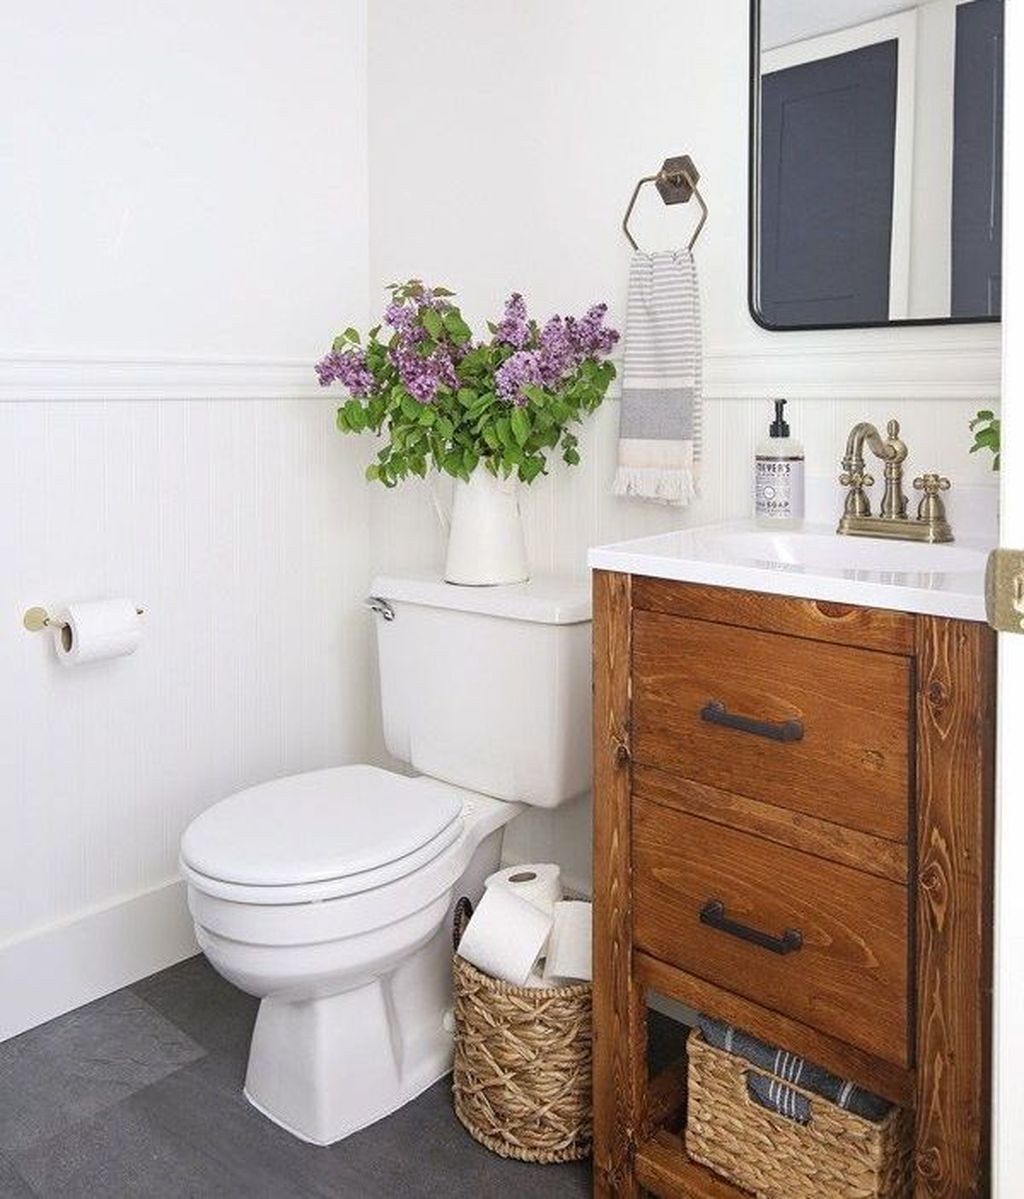 49 Stunning Small Half Bathroom Designs Ideas